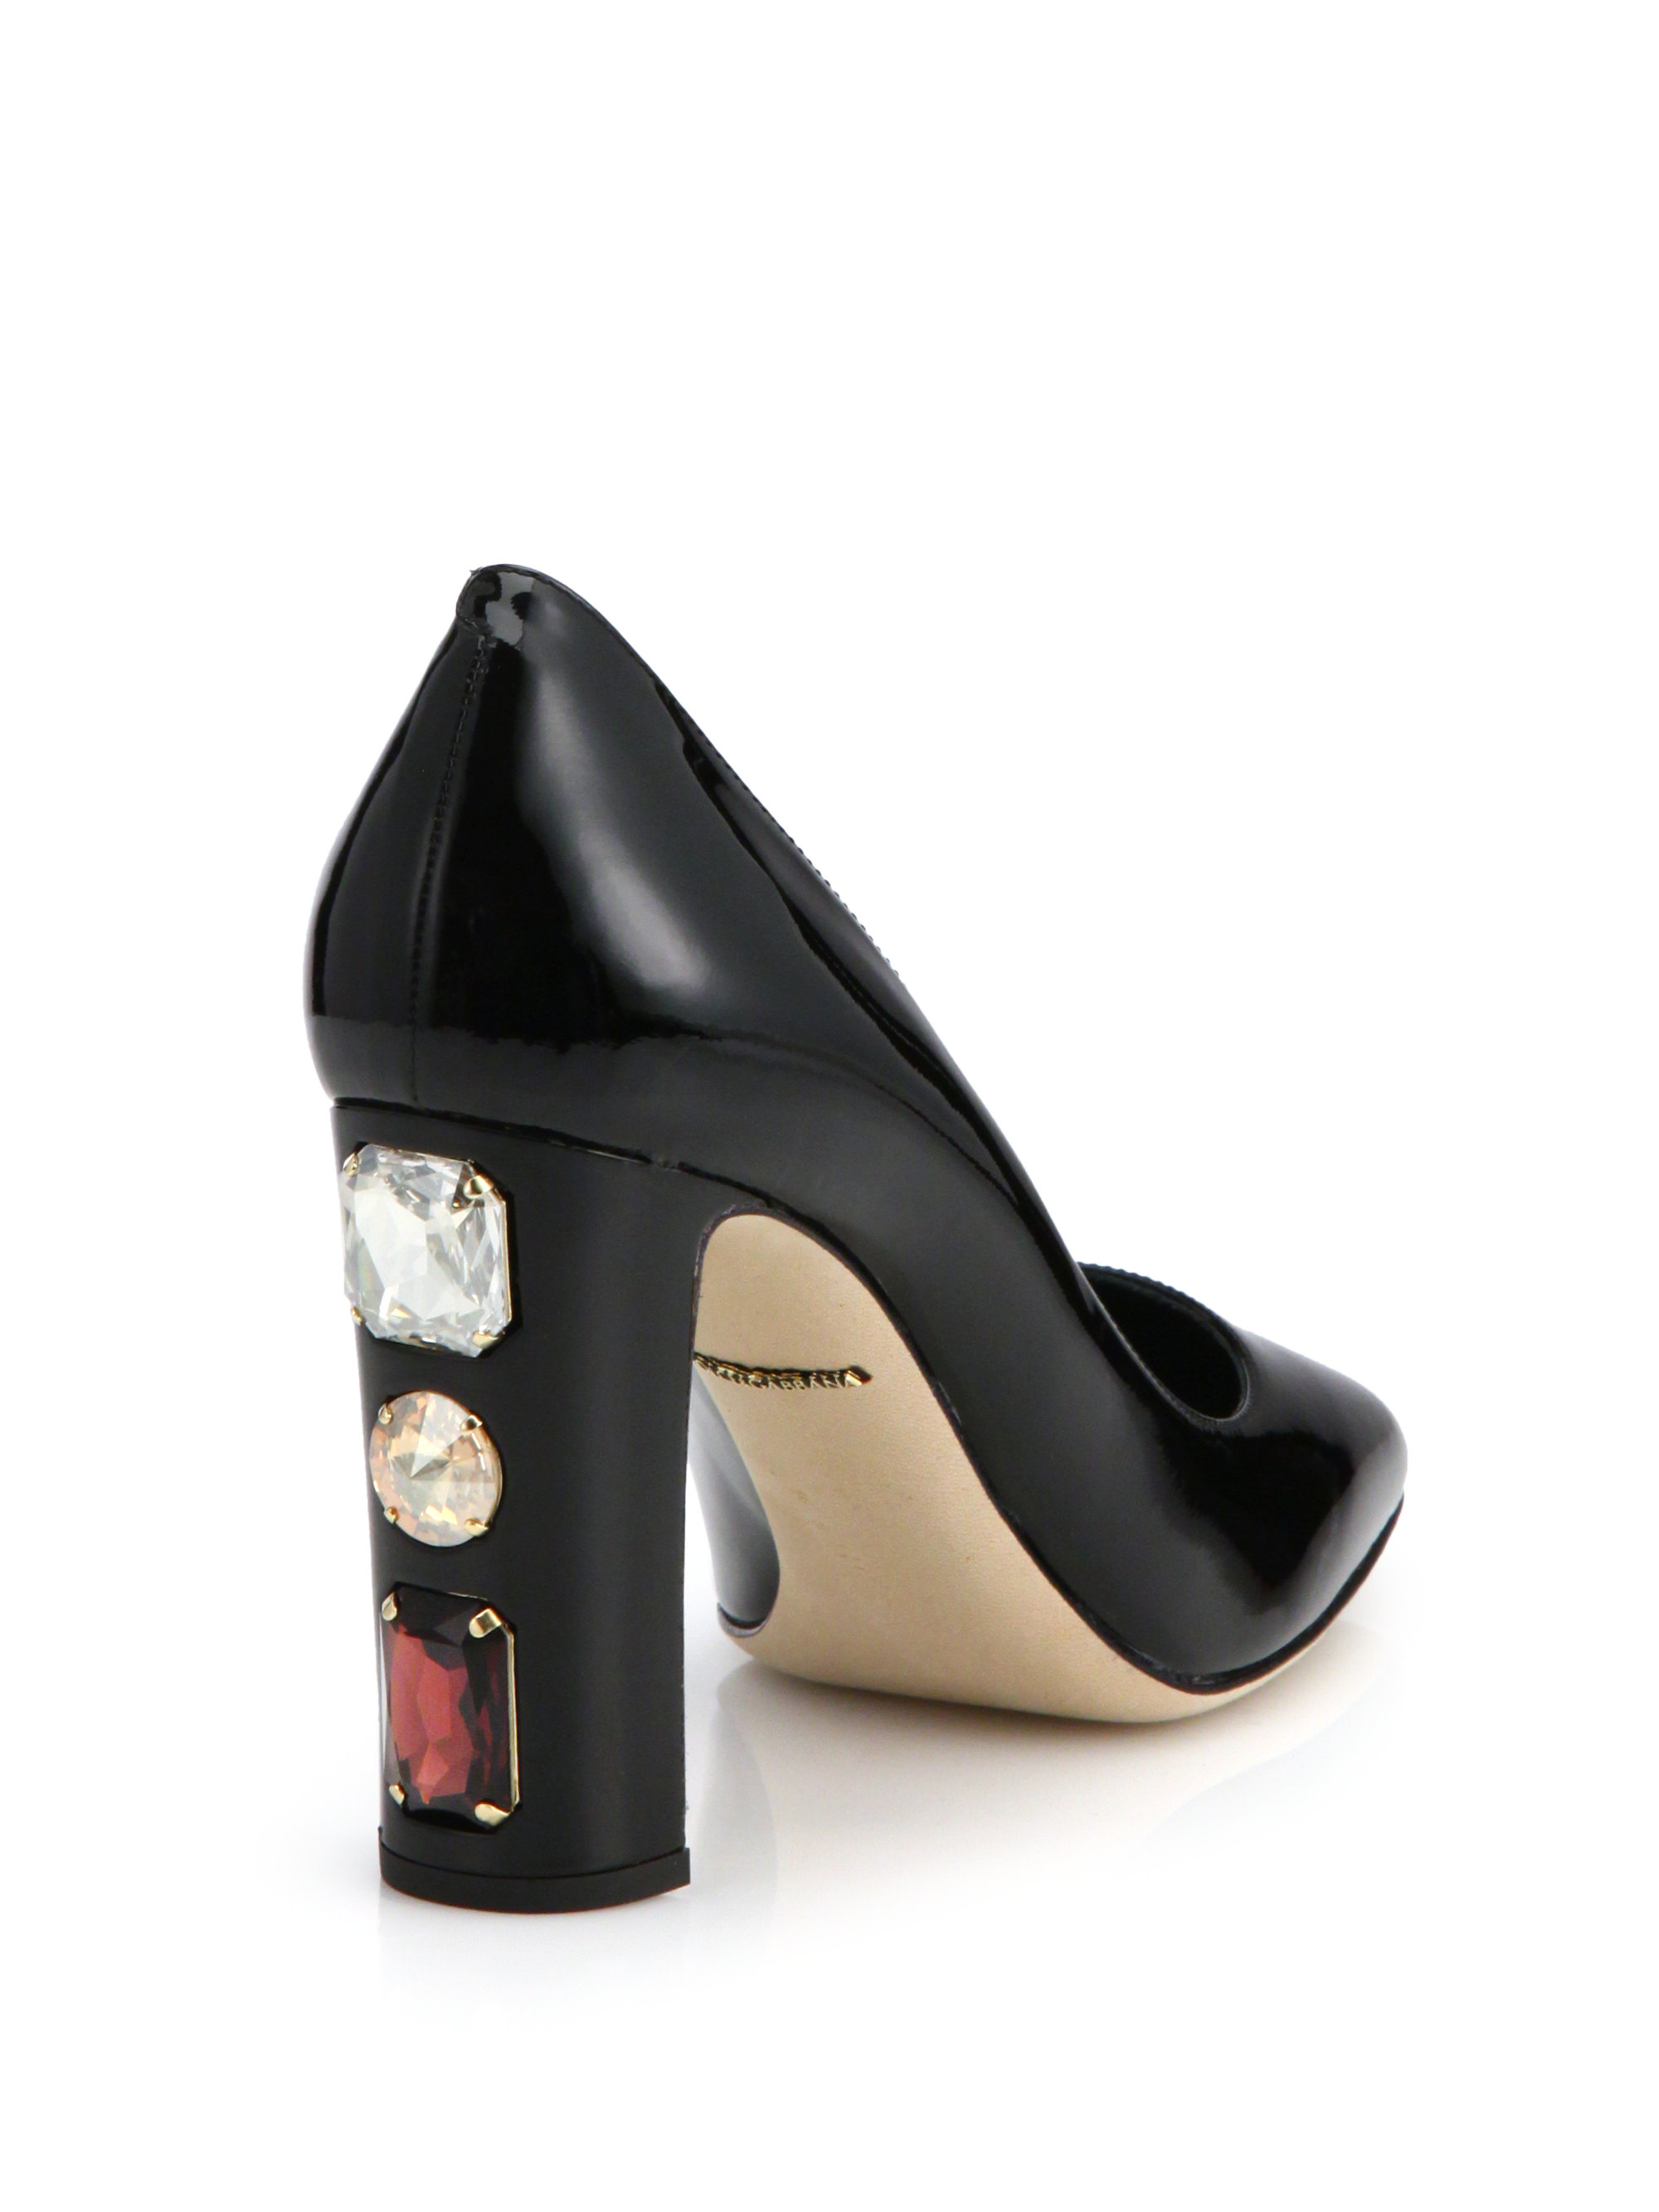 Dolce & gabbana Patent Leather Jewel-heel Pumps in Black ...